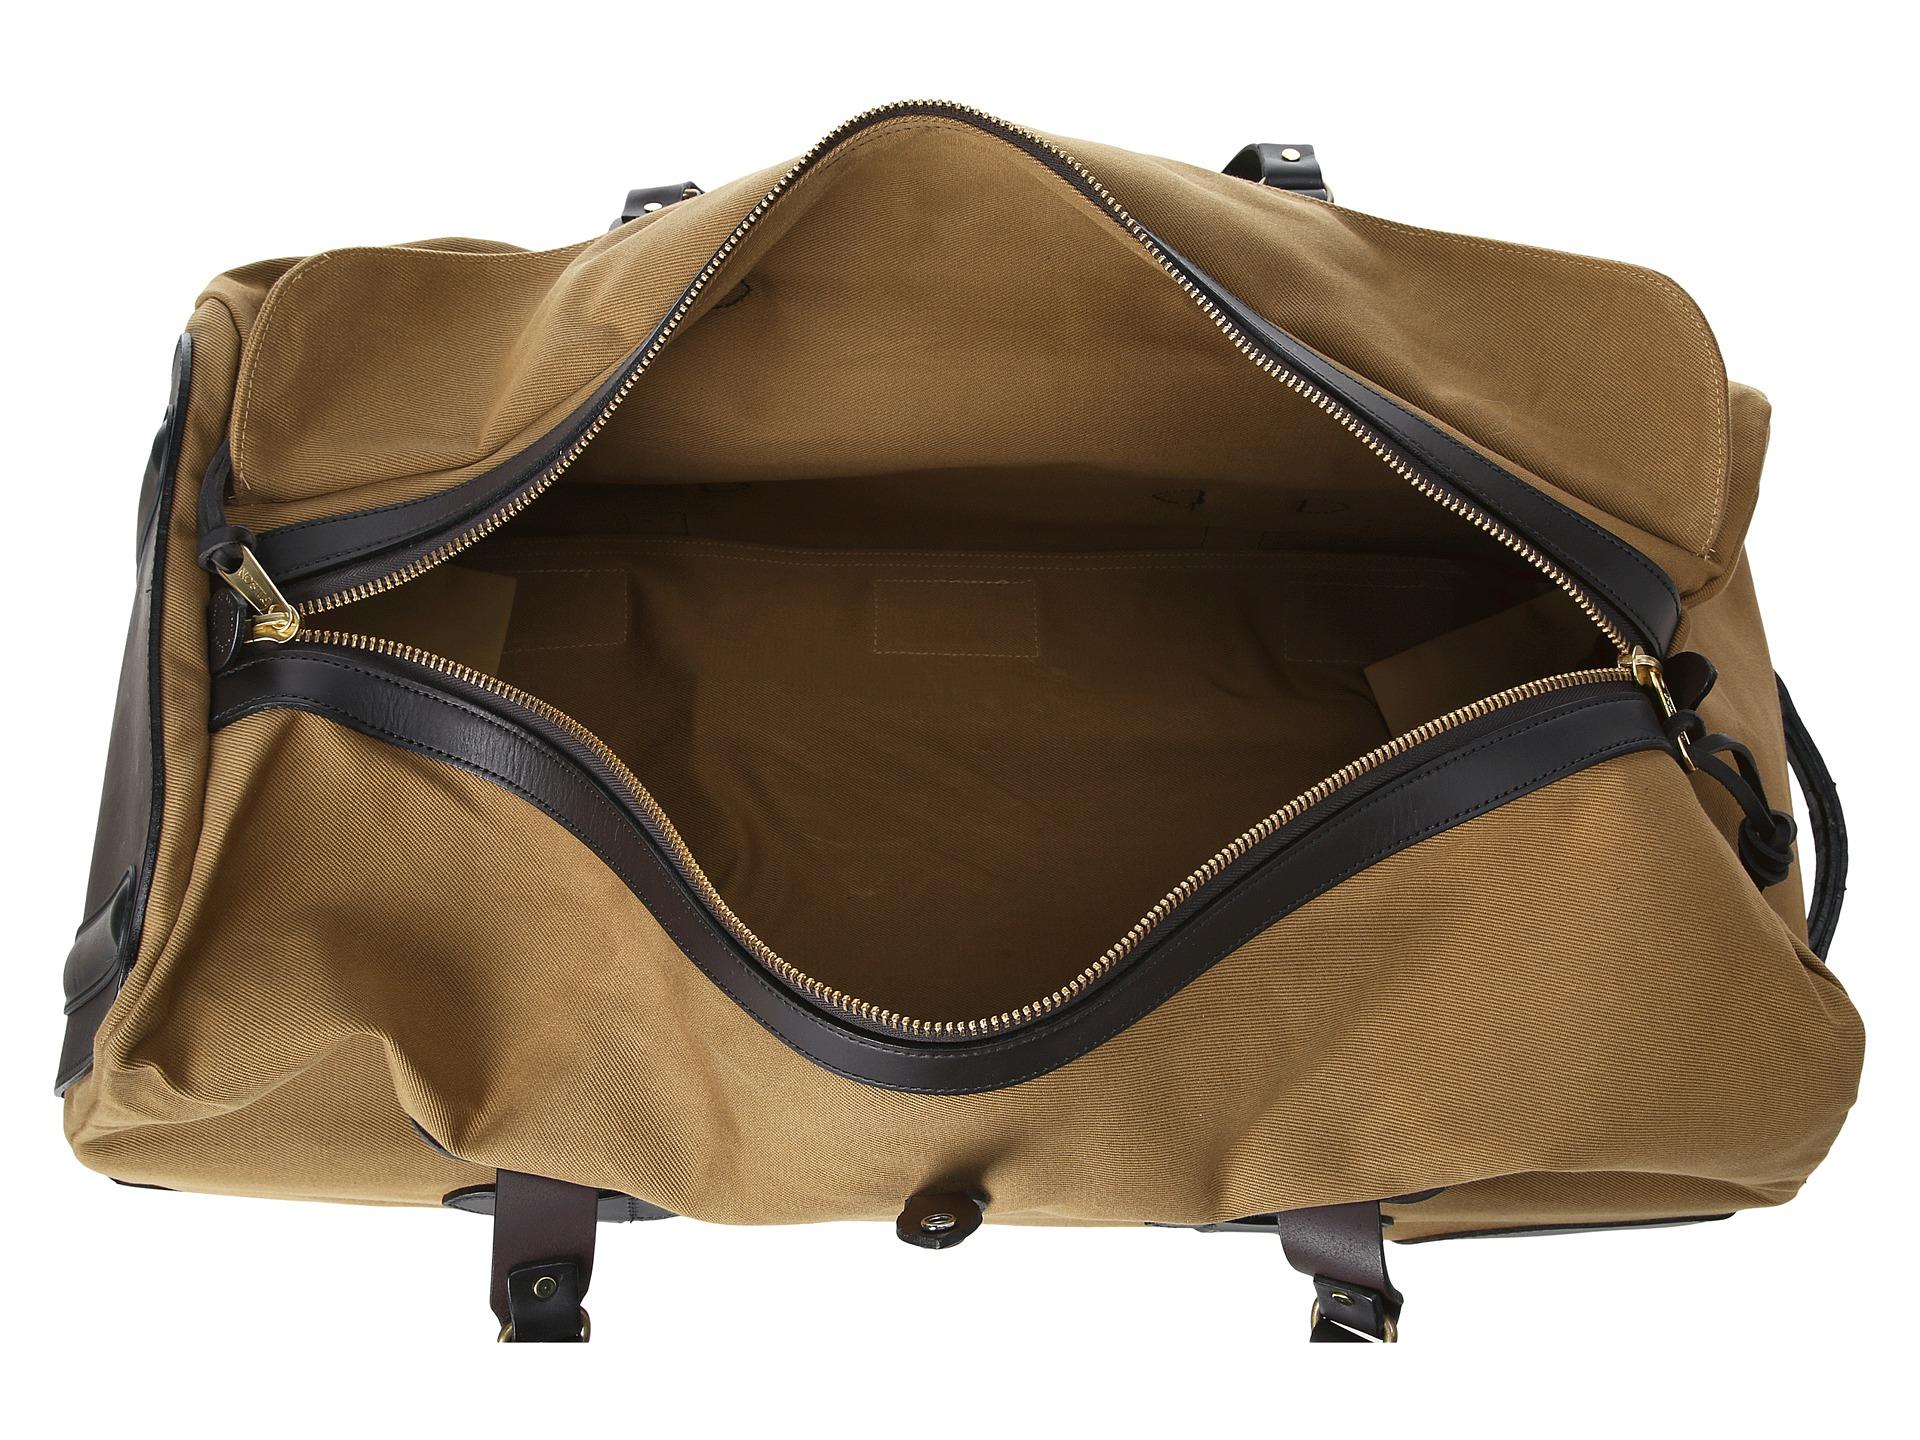 Filson Large Wheeled Duffle Bag Shipped Free At Zappos